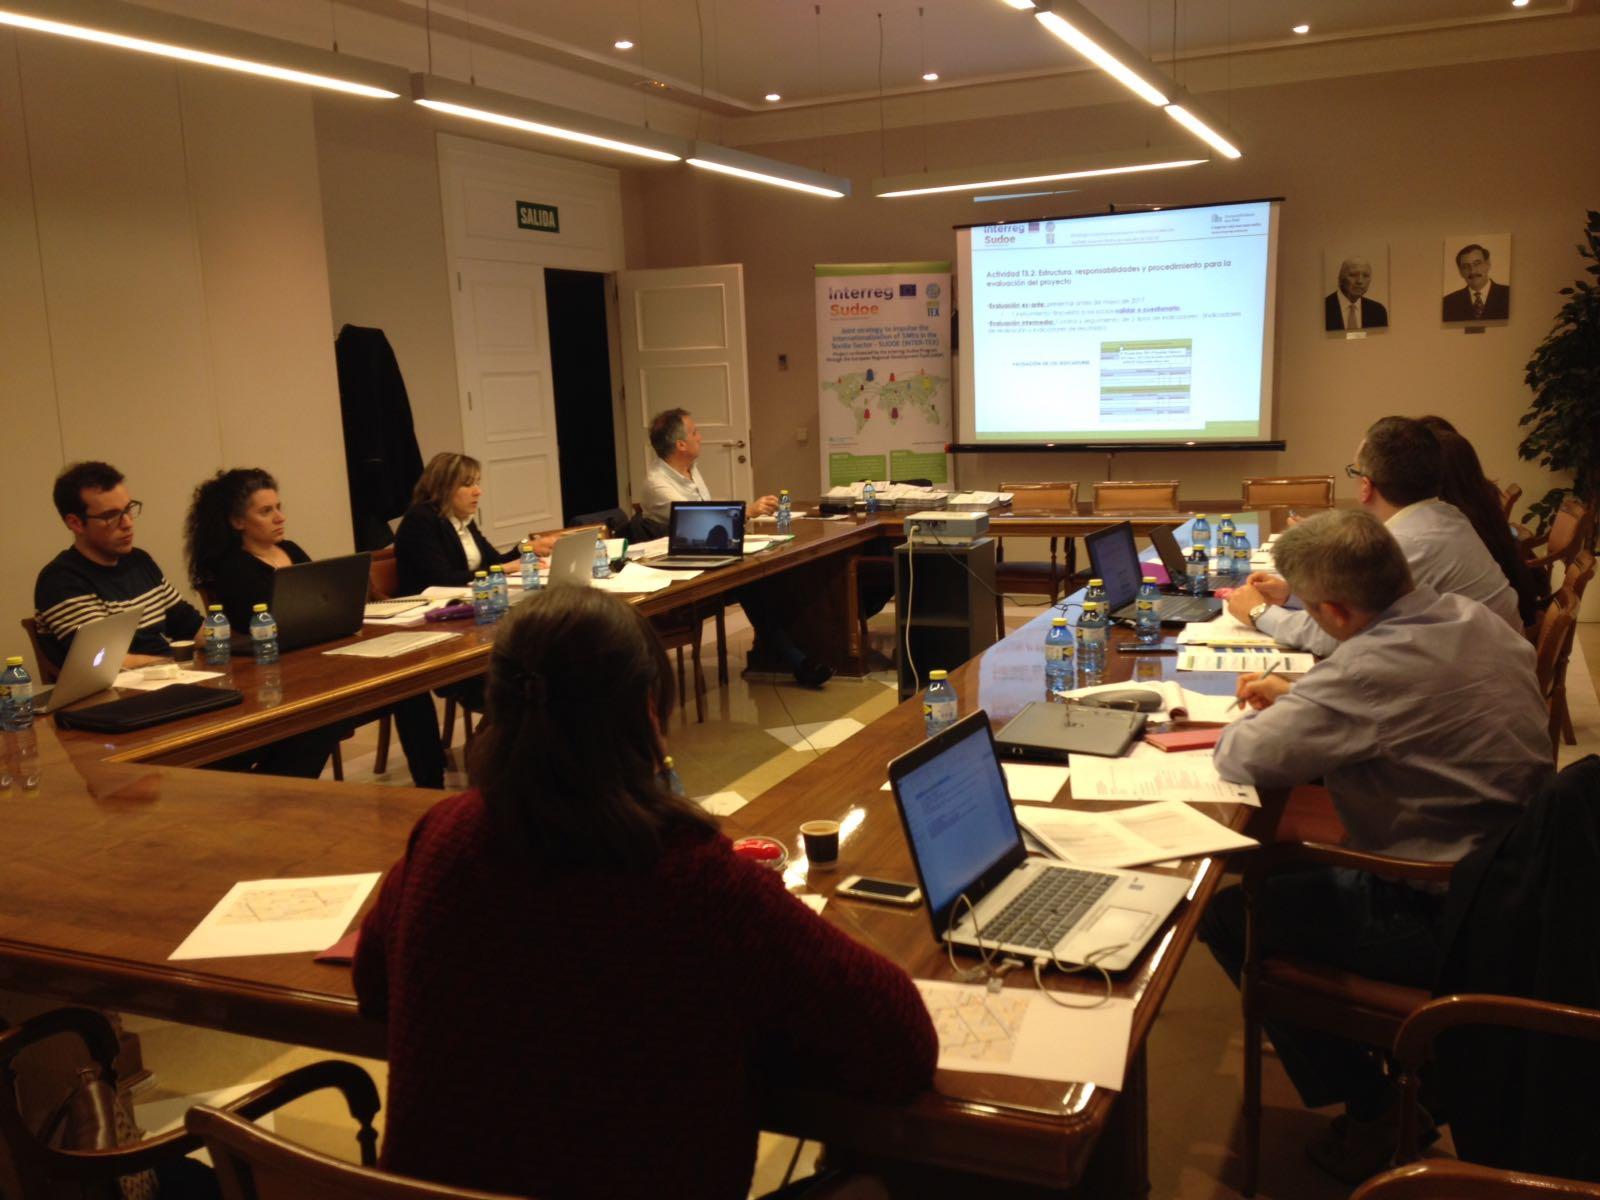 2e réunion transnationale du projet INTER-TEX a eu lieu à Valence Mars dernier